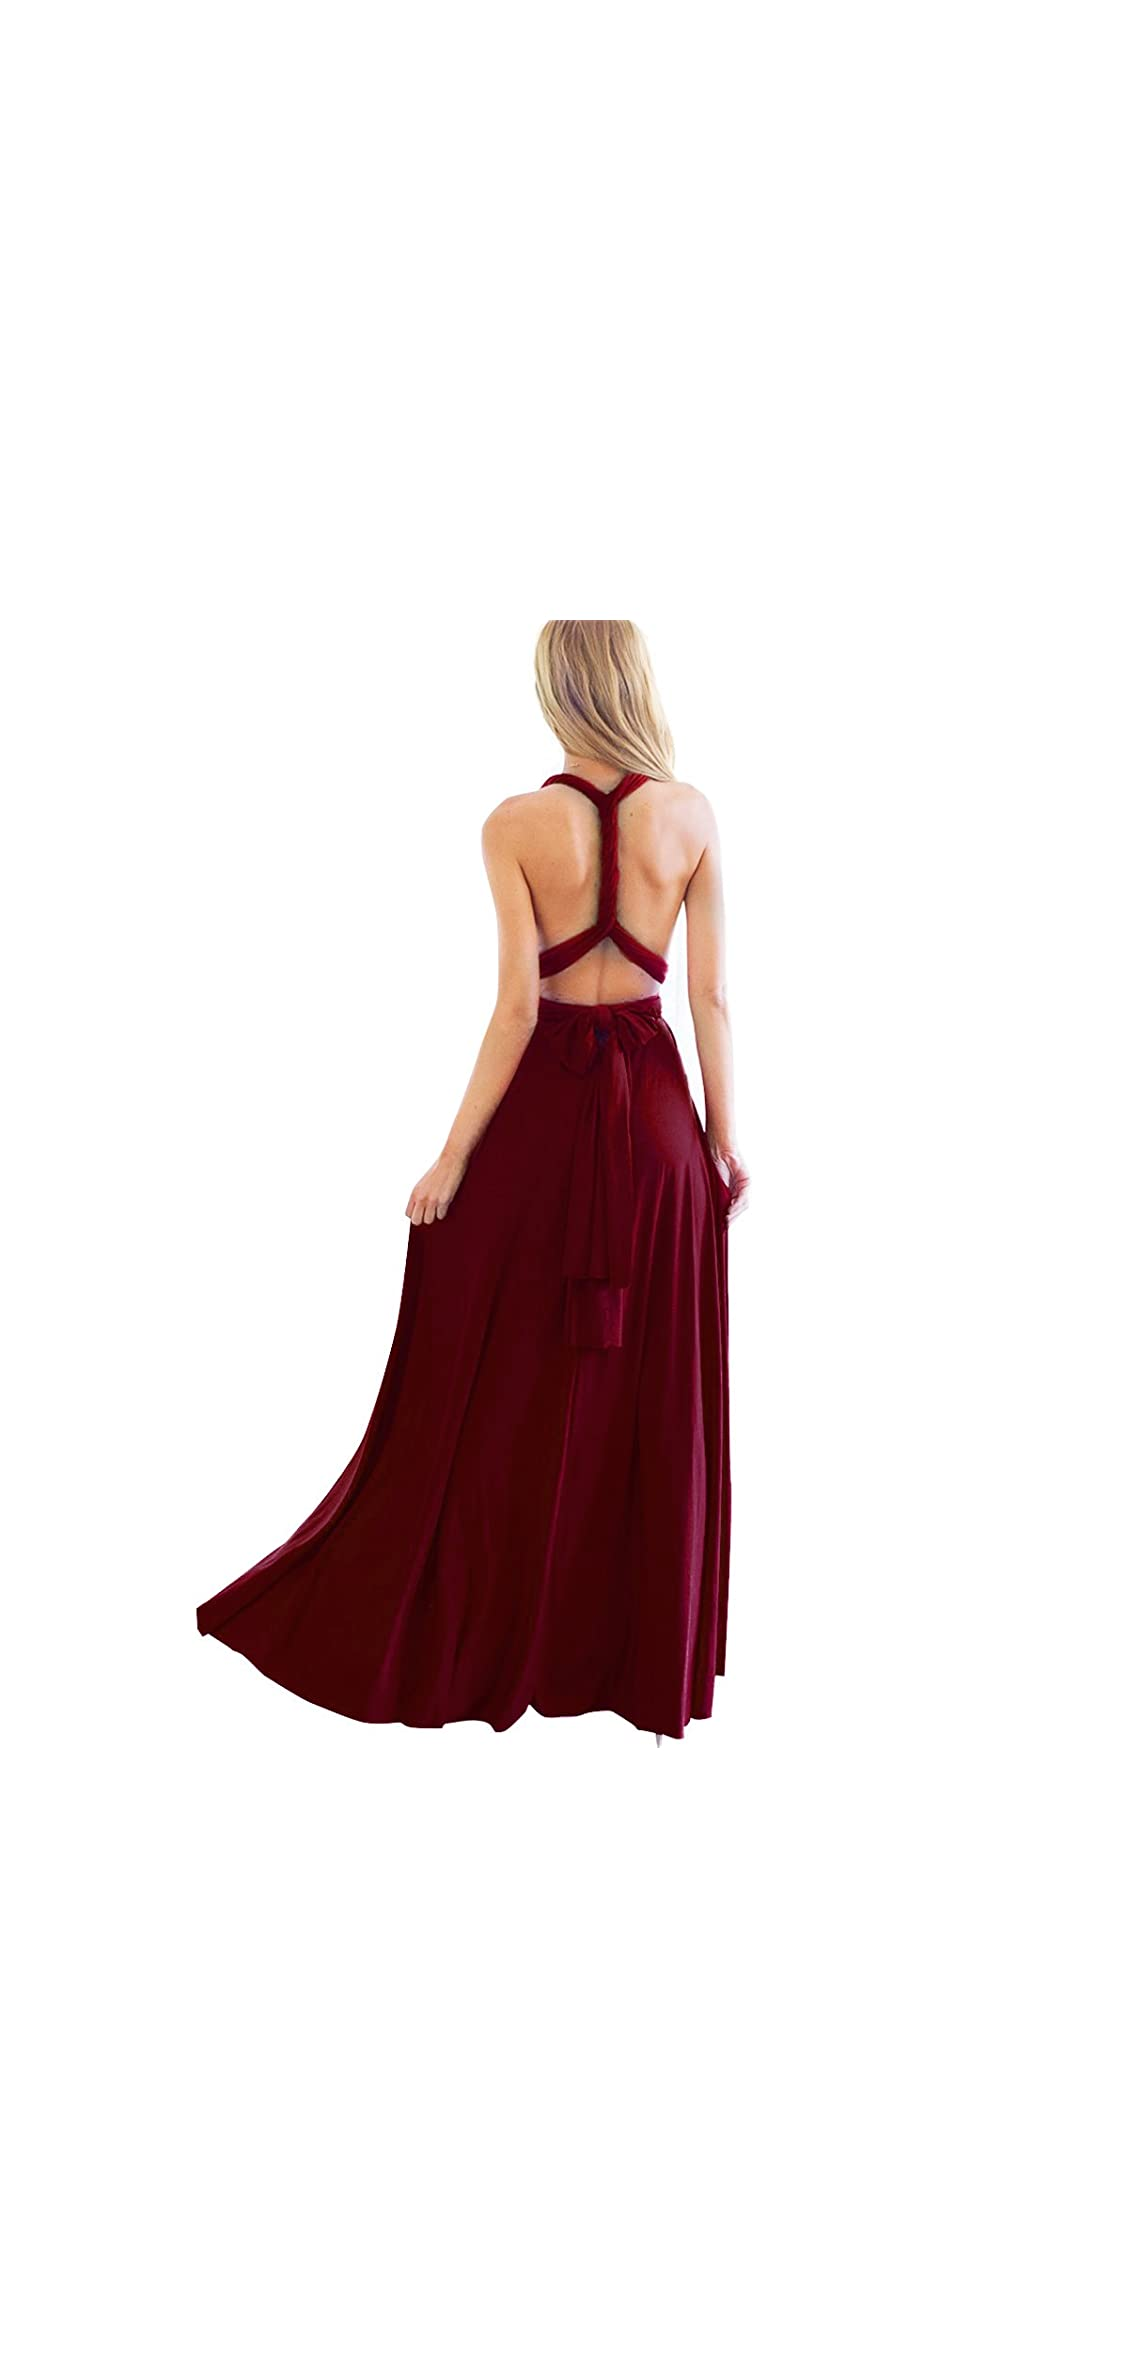 Women Transformer Convertible Bridesmaid Maxi Dress Multi-way